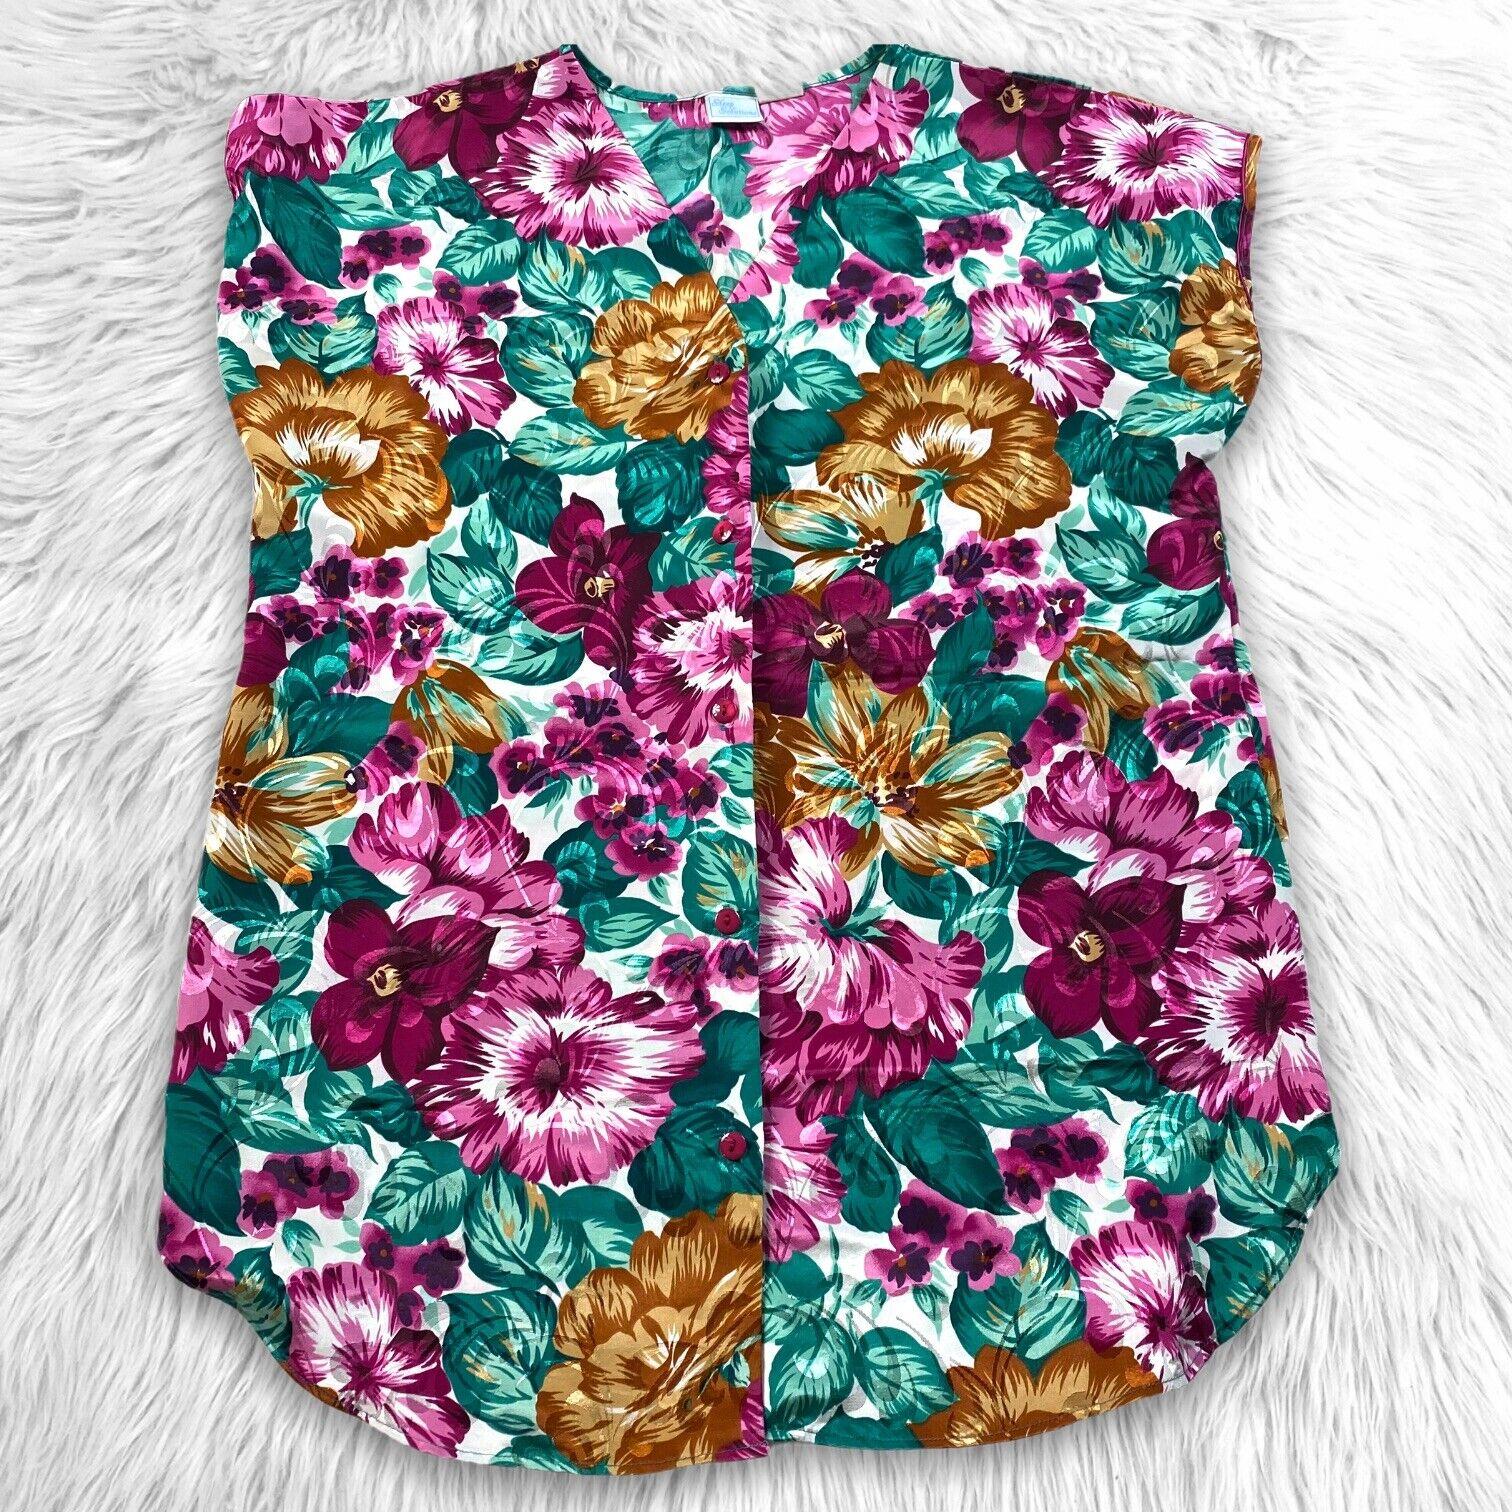 Vtg 90's Satin Floral Sleep Top Shirt Gown Size 1X Cottagecore